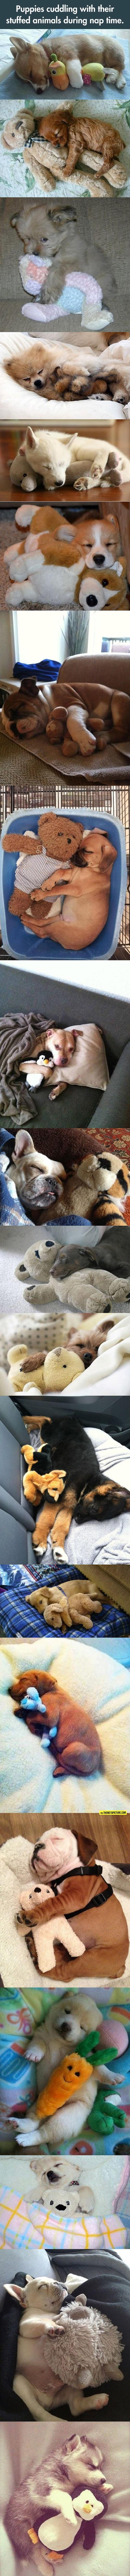 Best Naps You